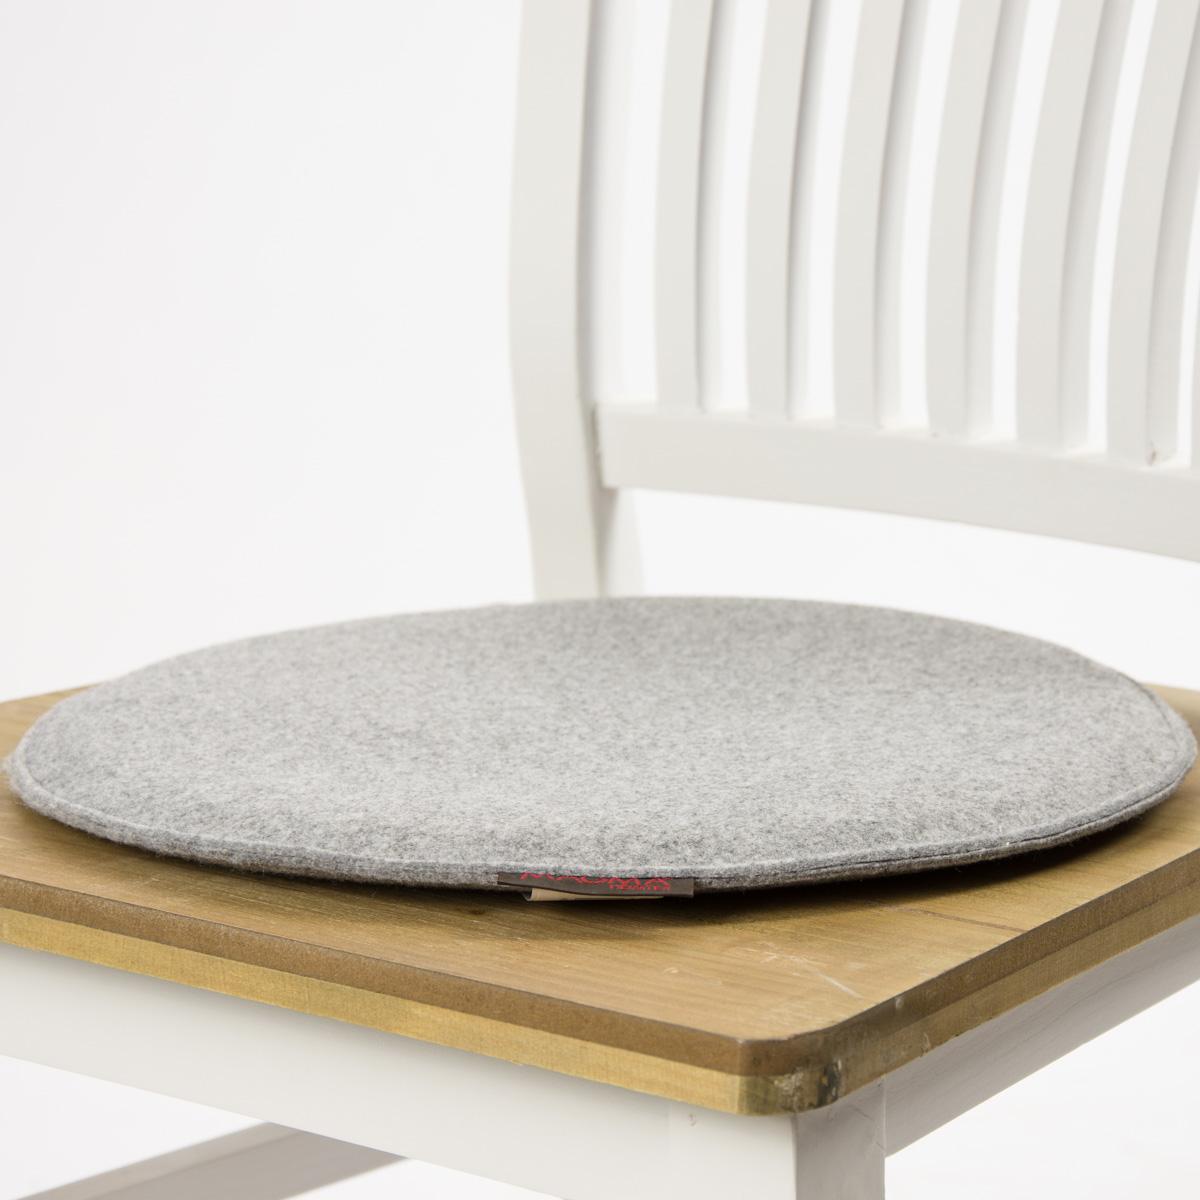 stuhlkissen avaro filz rund grau meliert 35x2cm ebay. Black Bedroom Furniture Sets. Home Design Ideas